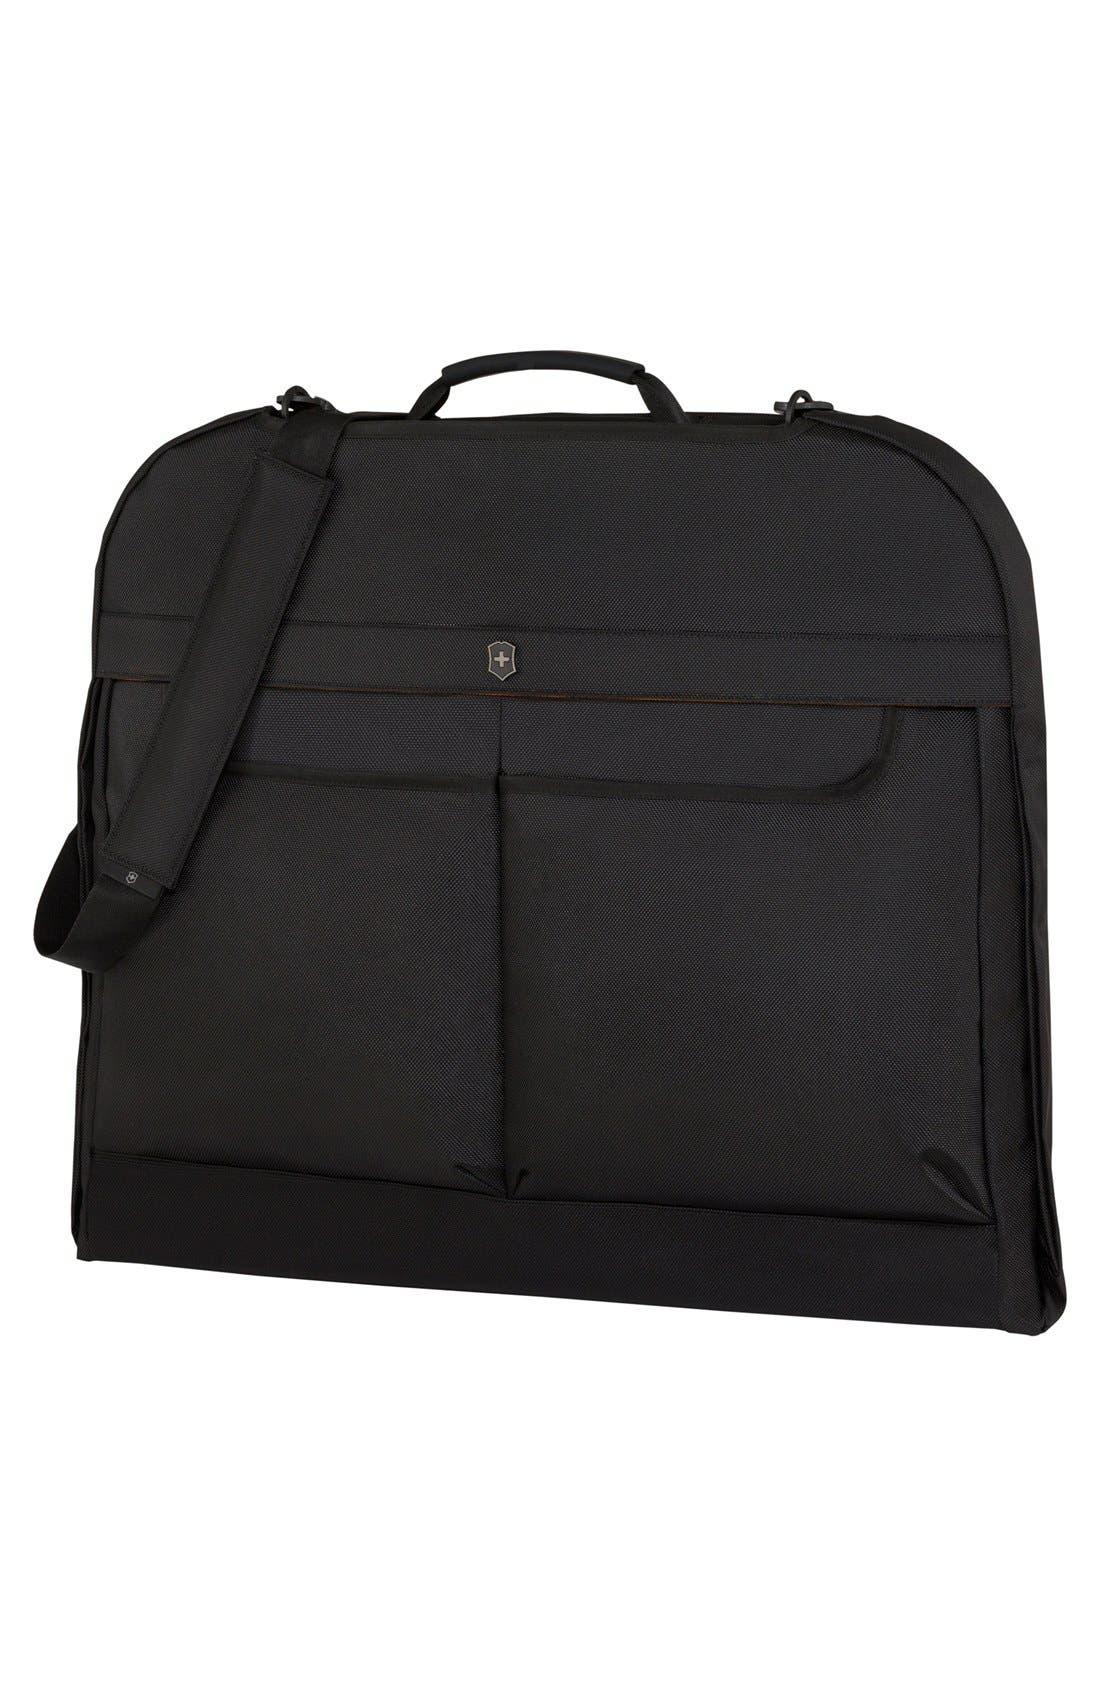 Victorinox Swiss Army® 'WT 5.0' Deluxe Garment Bag